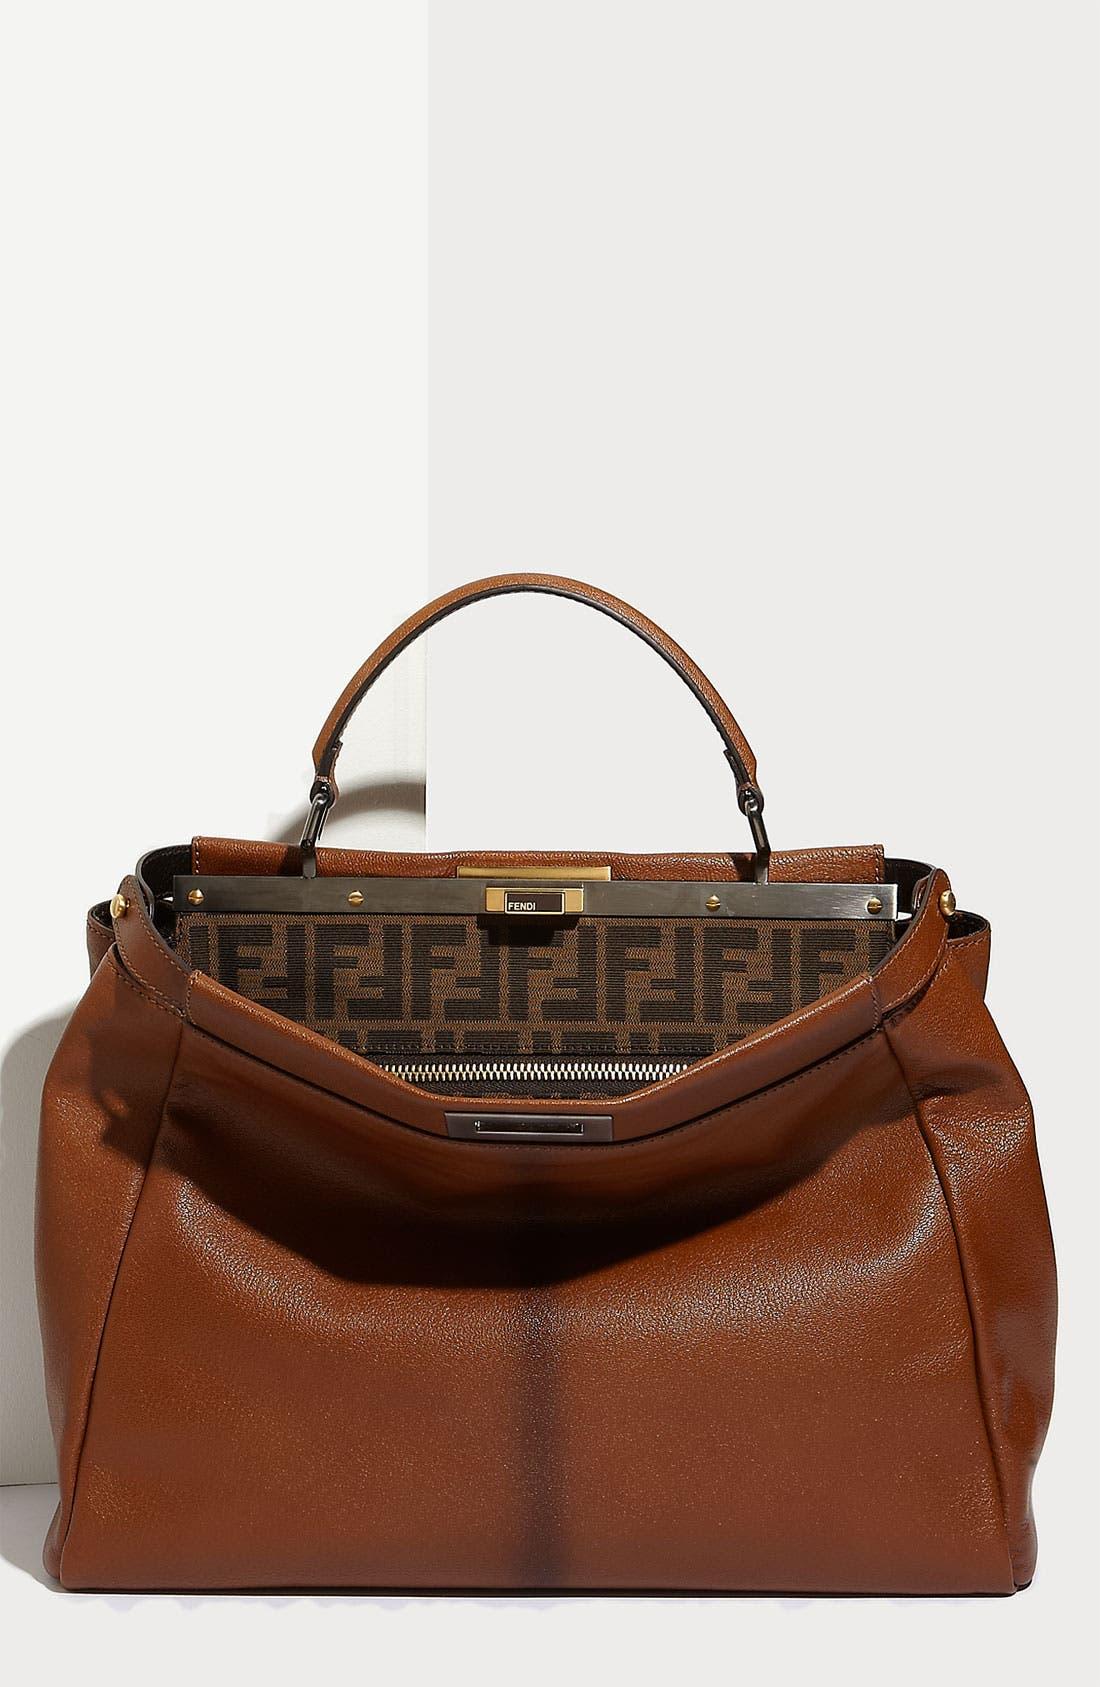 Main Image - Fendi 'Peekaboo - Large' Goatskin Leather Satchel